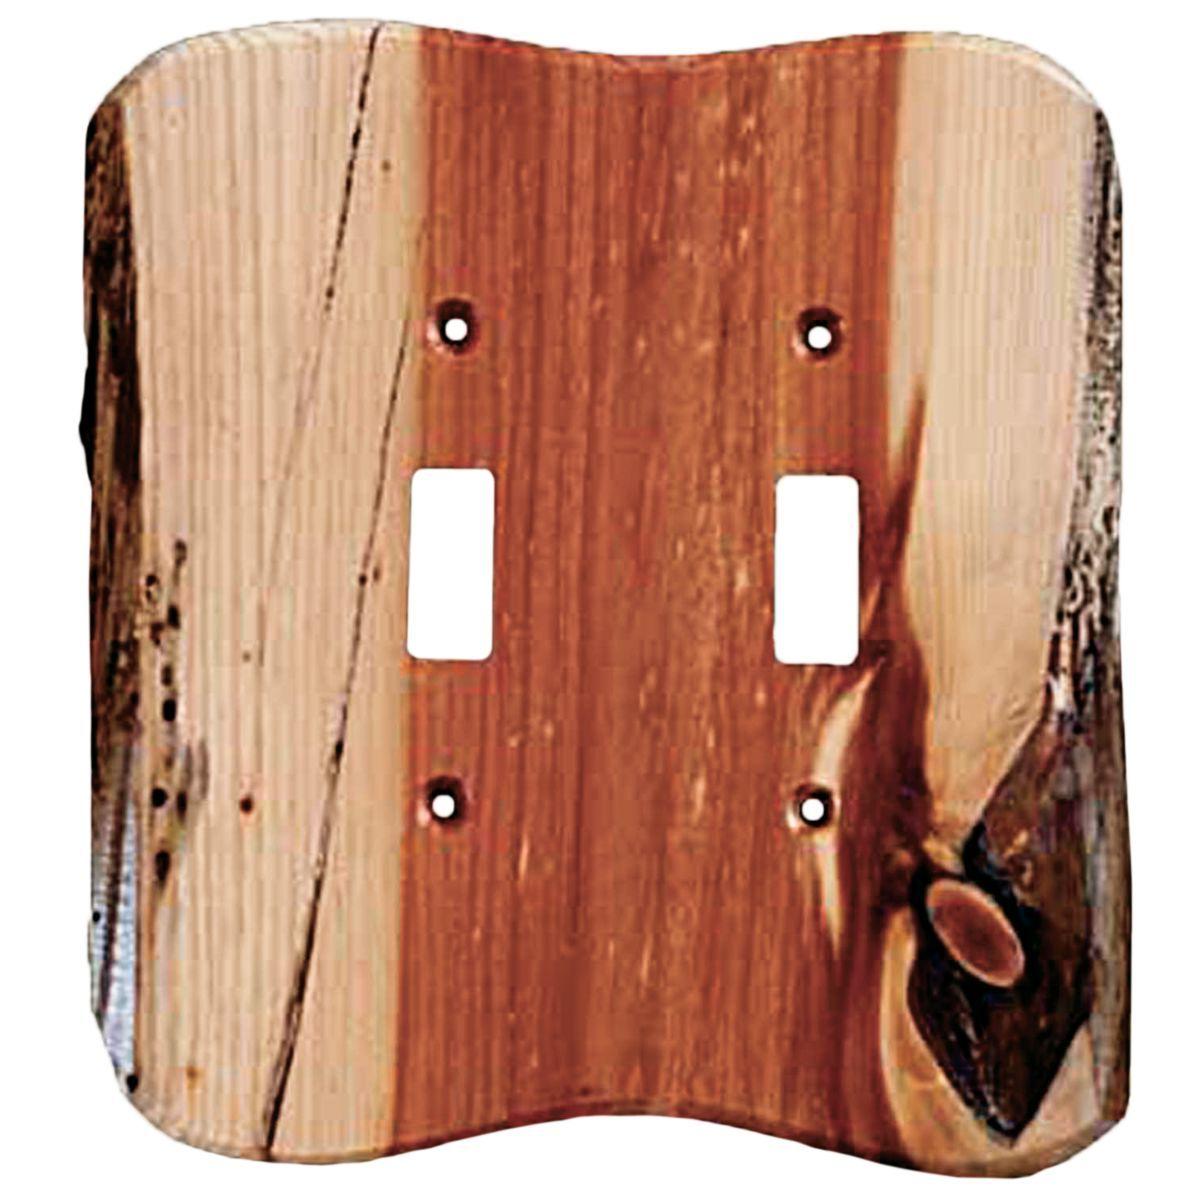 Rustic Juniper Electrical Covers